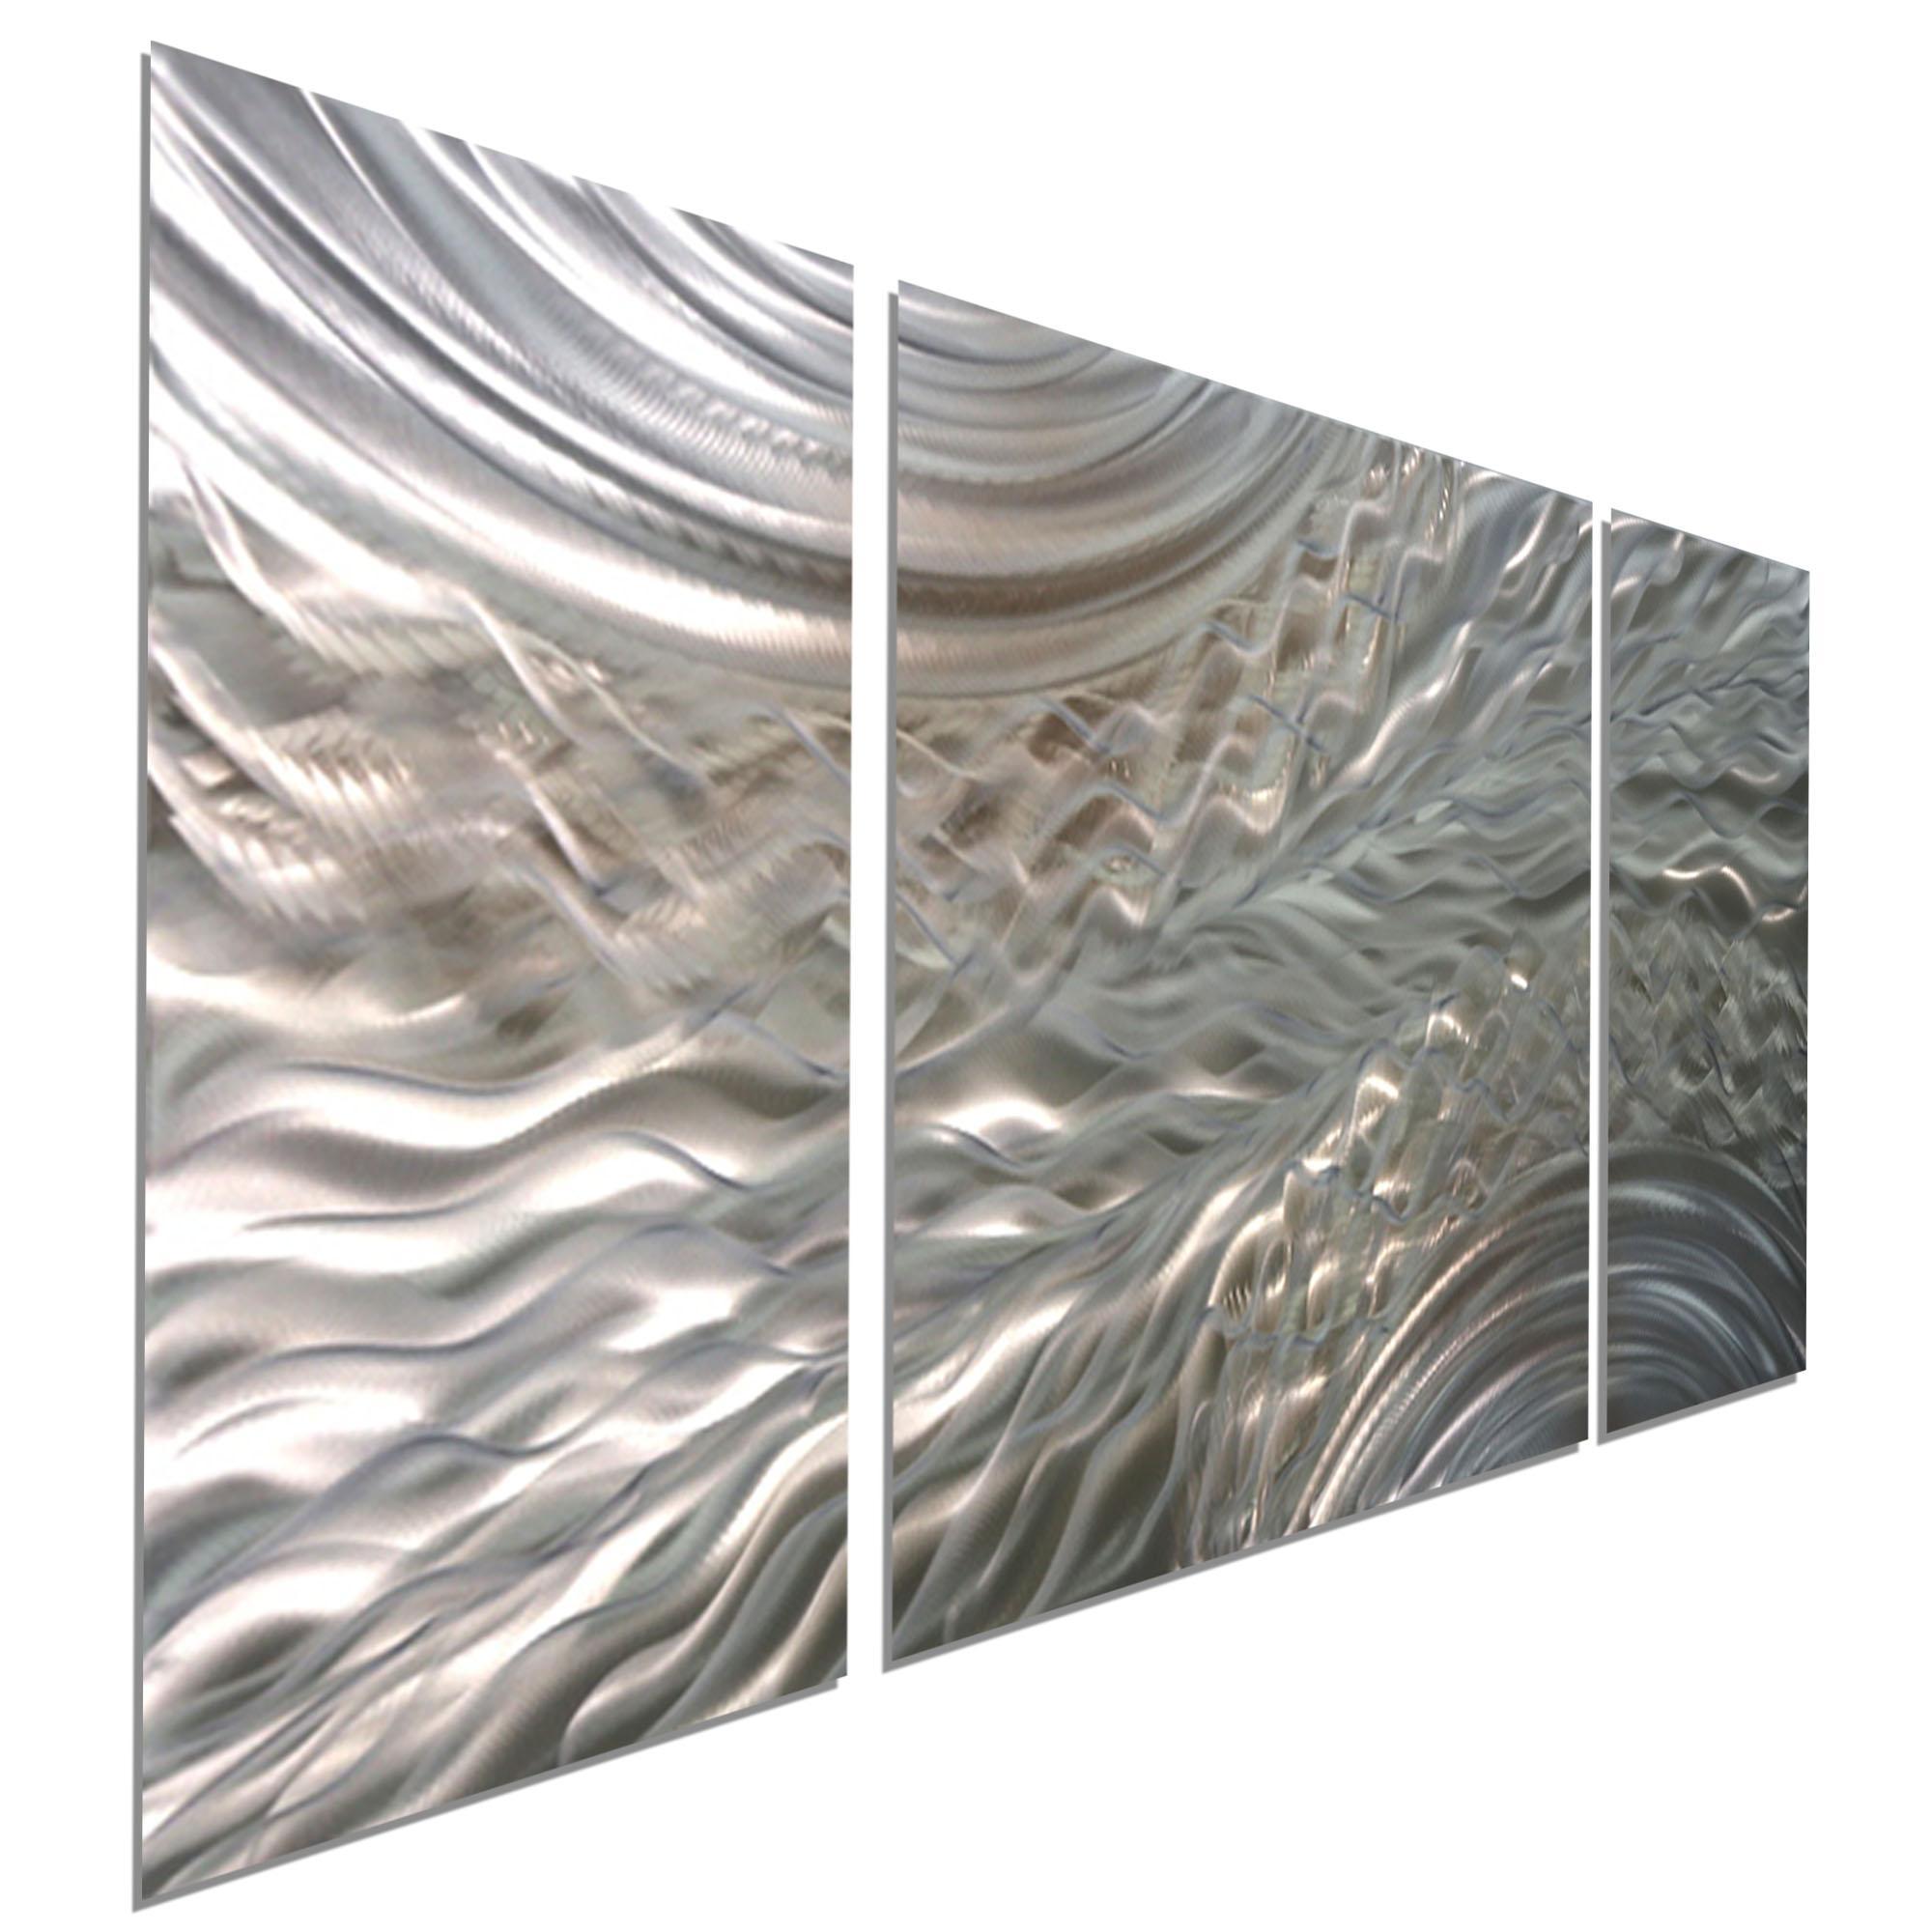 Metal Wall Art | Handmade Metal Art, Panel Art & Wall Sculptures For Hammered Metal Wall Art (Image 12 of 20)